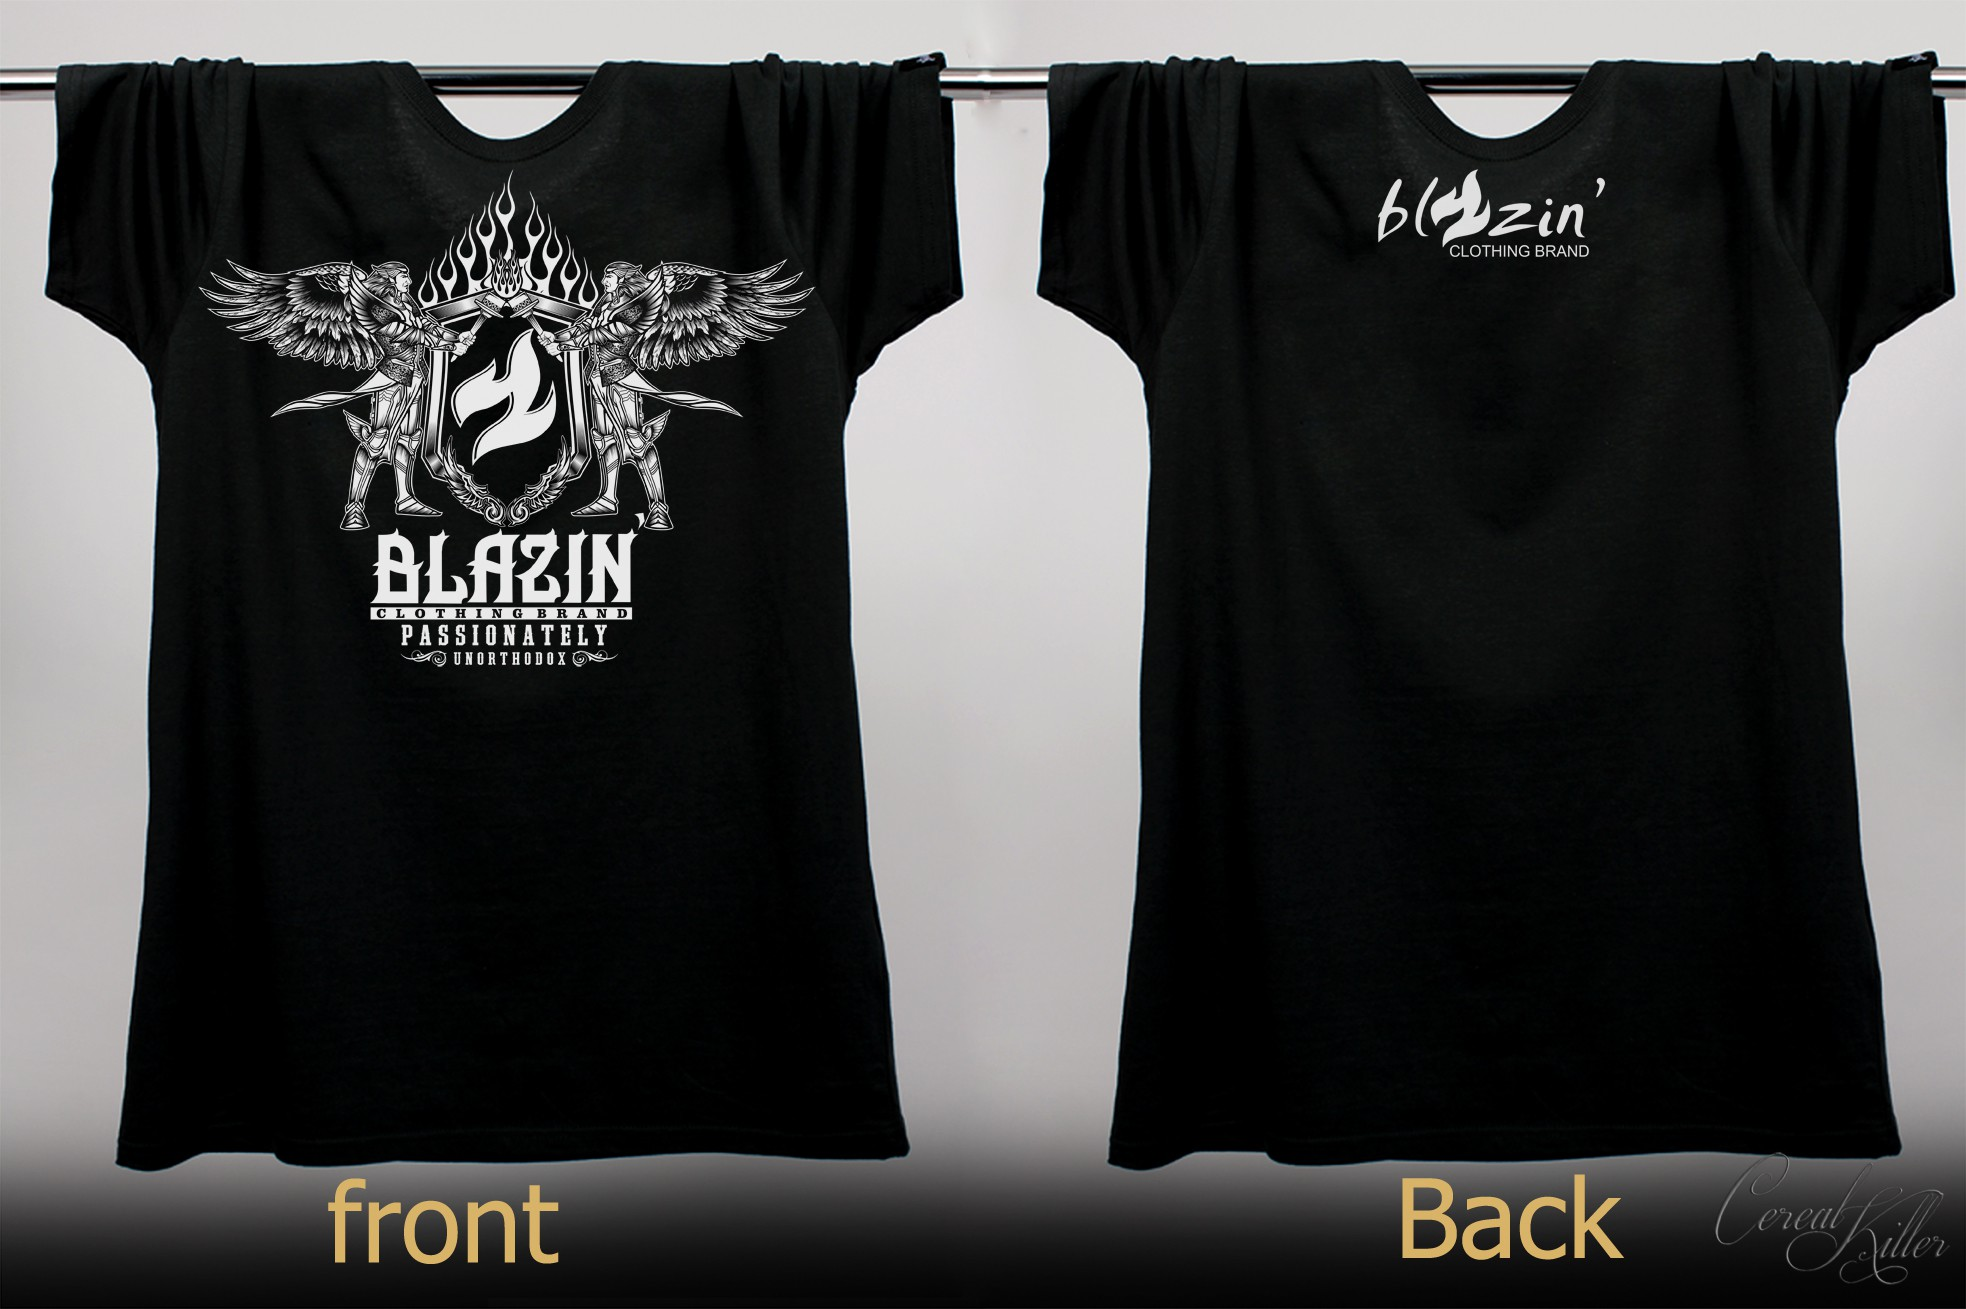 Create a hot t-shirt design